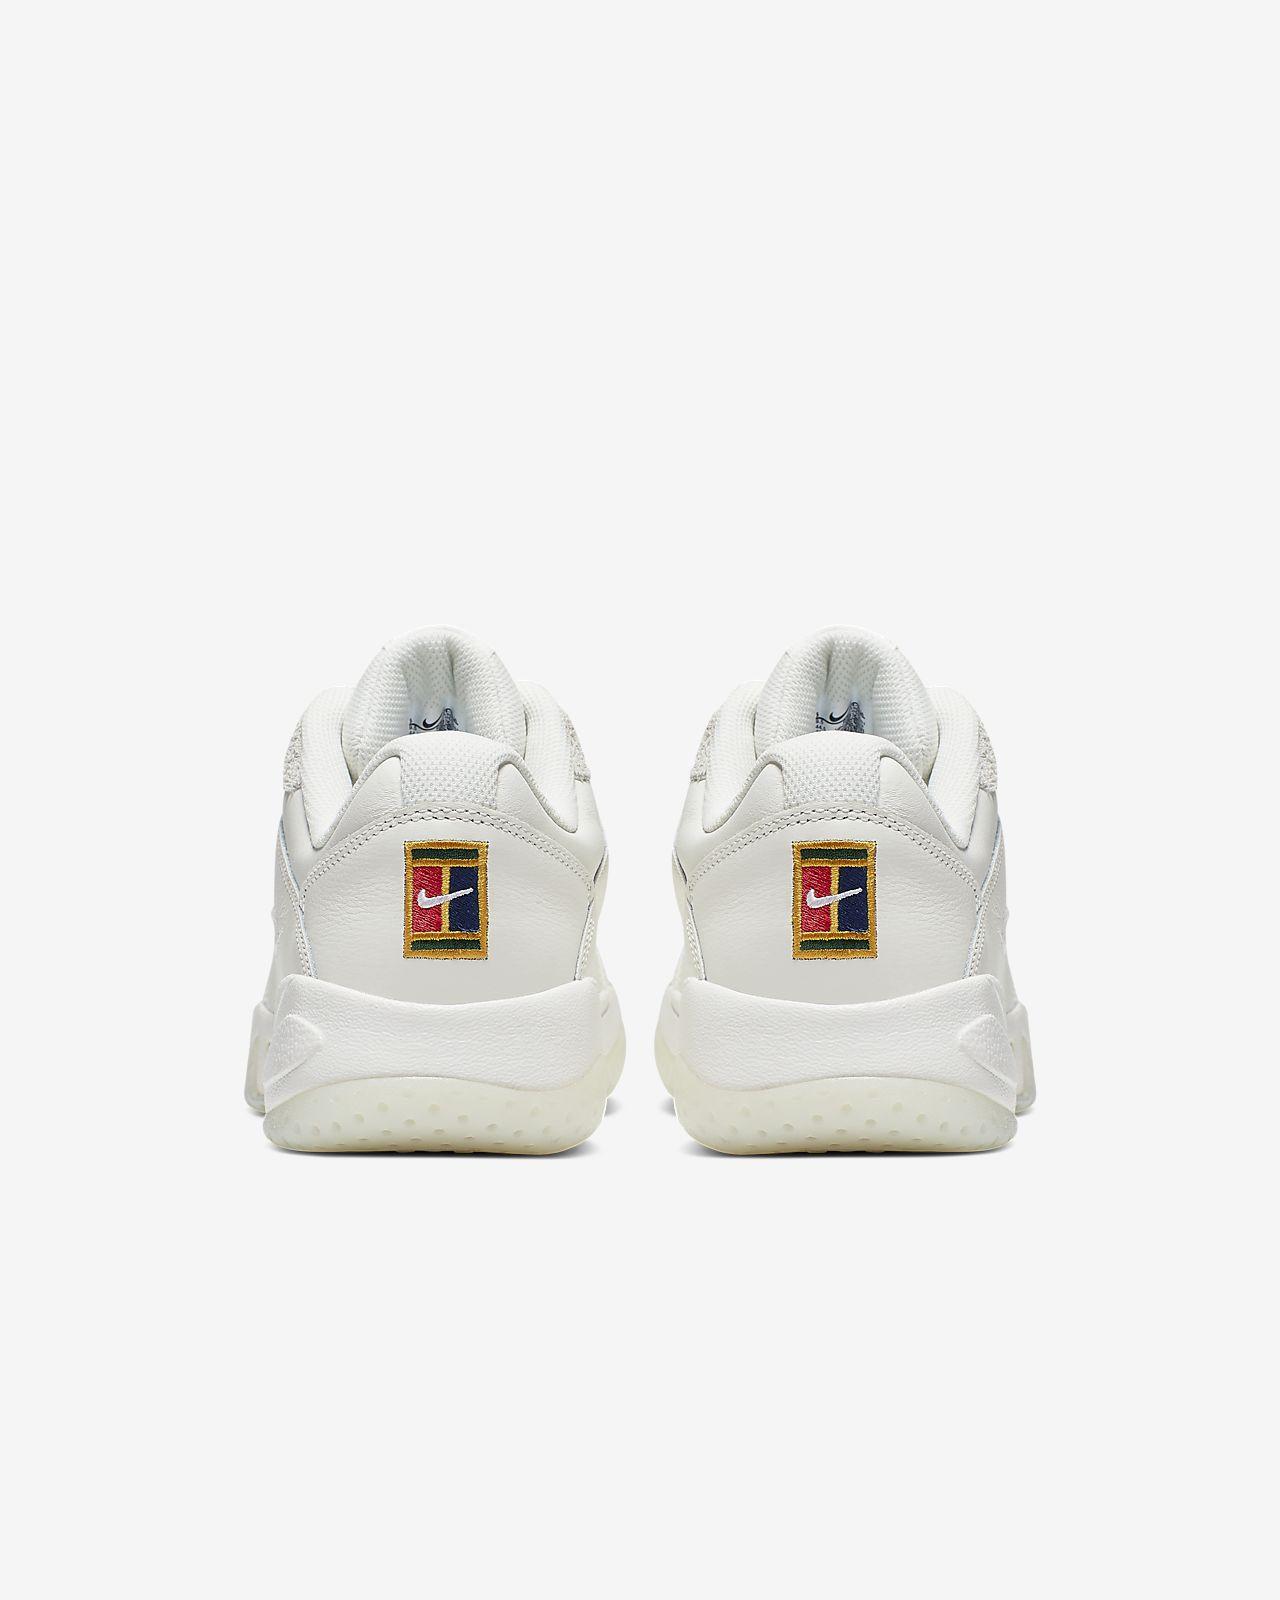 NikeCourt Lite 2 Premium Men's Tennis Shoe